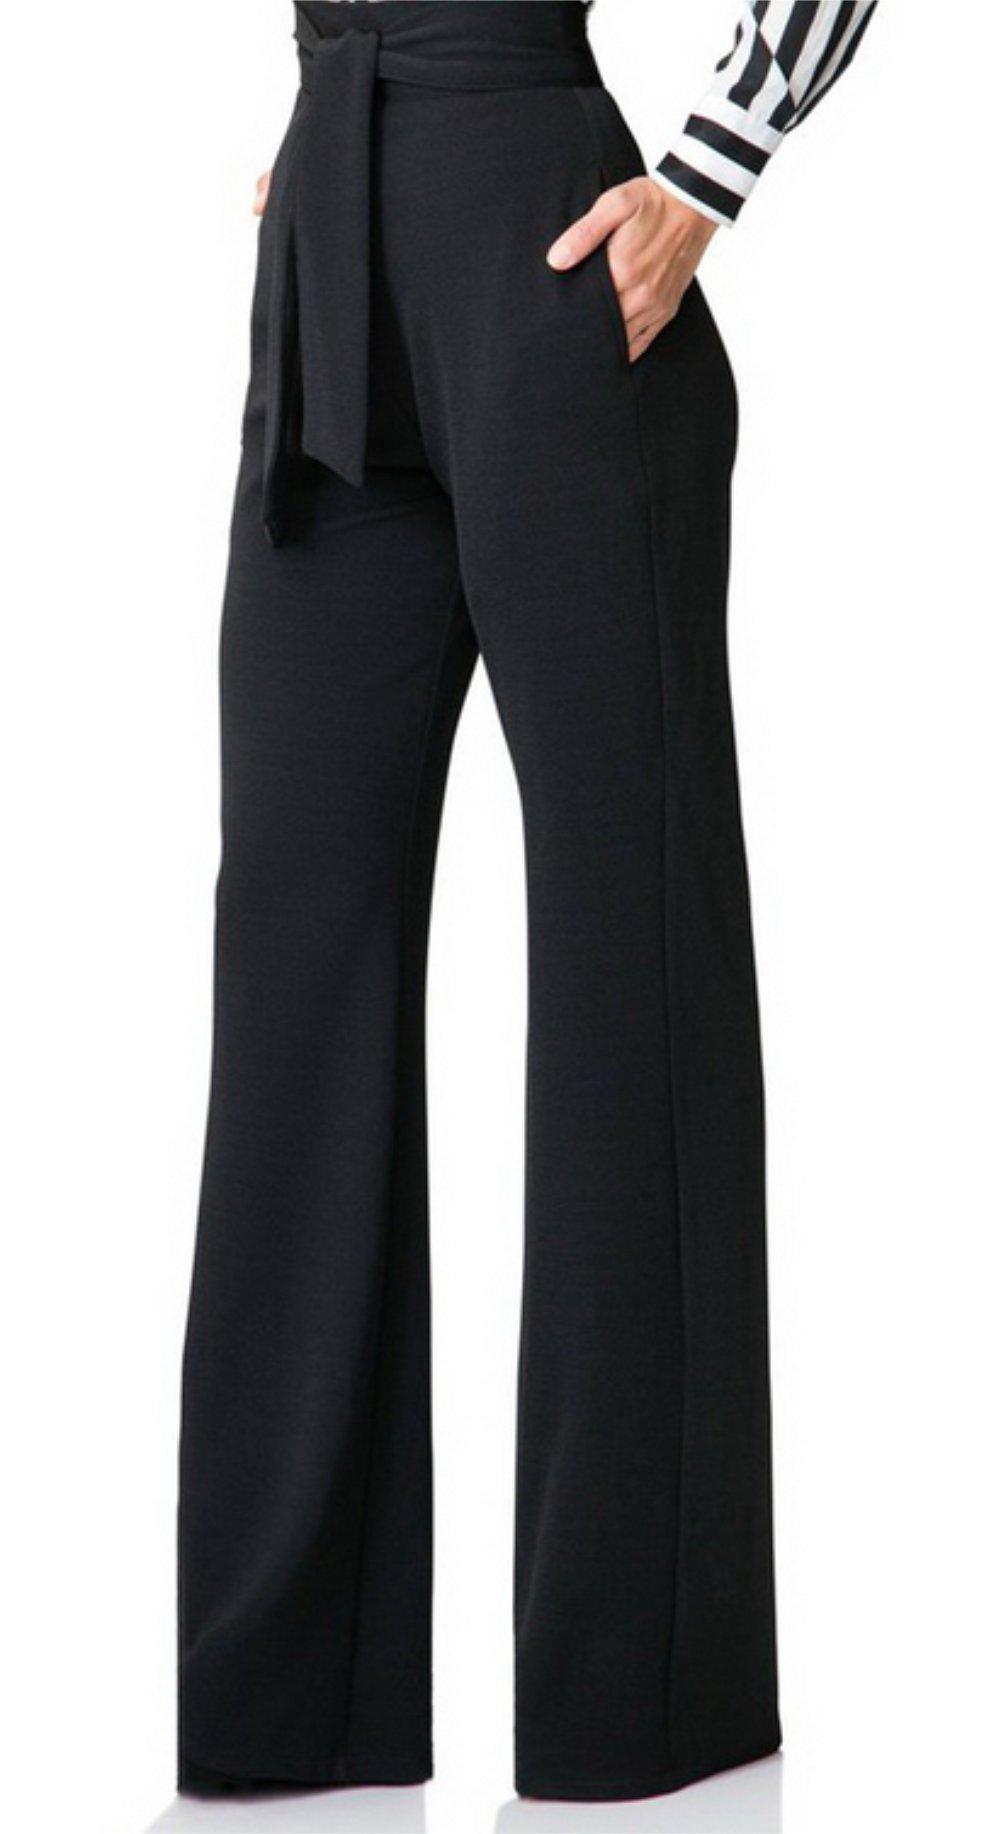 Molisry Women Casual Stretchy Straight Leg High Waisted Long Pants with Belt by Molisry (Image #2)